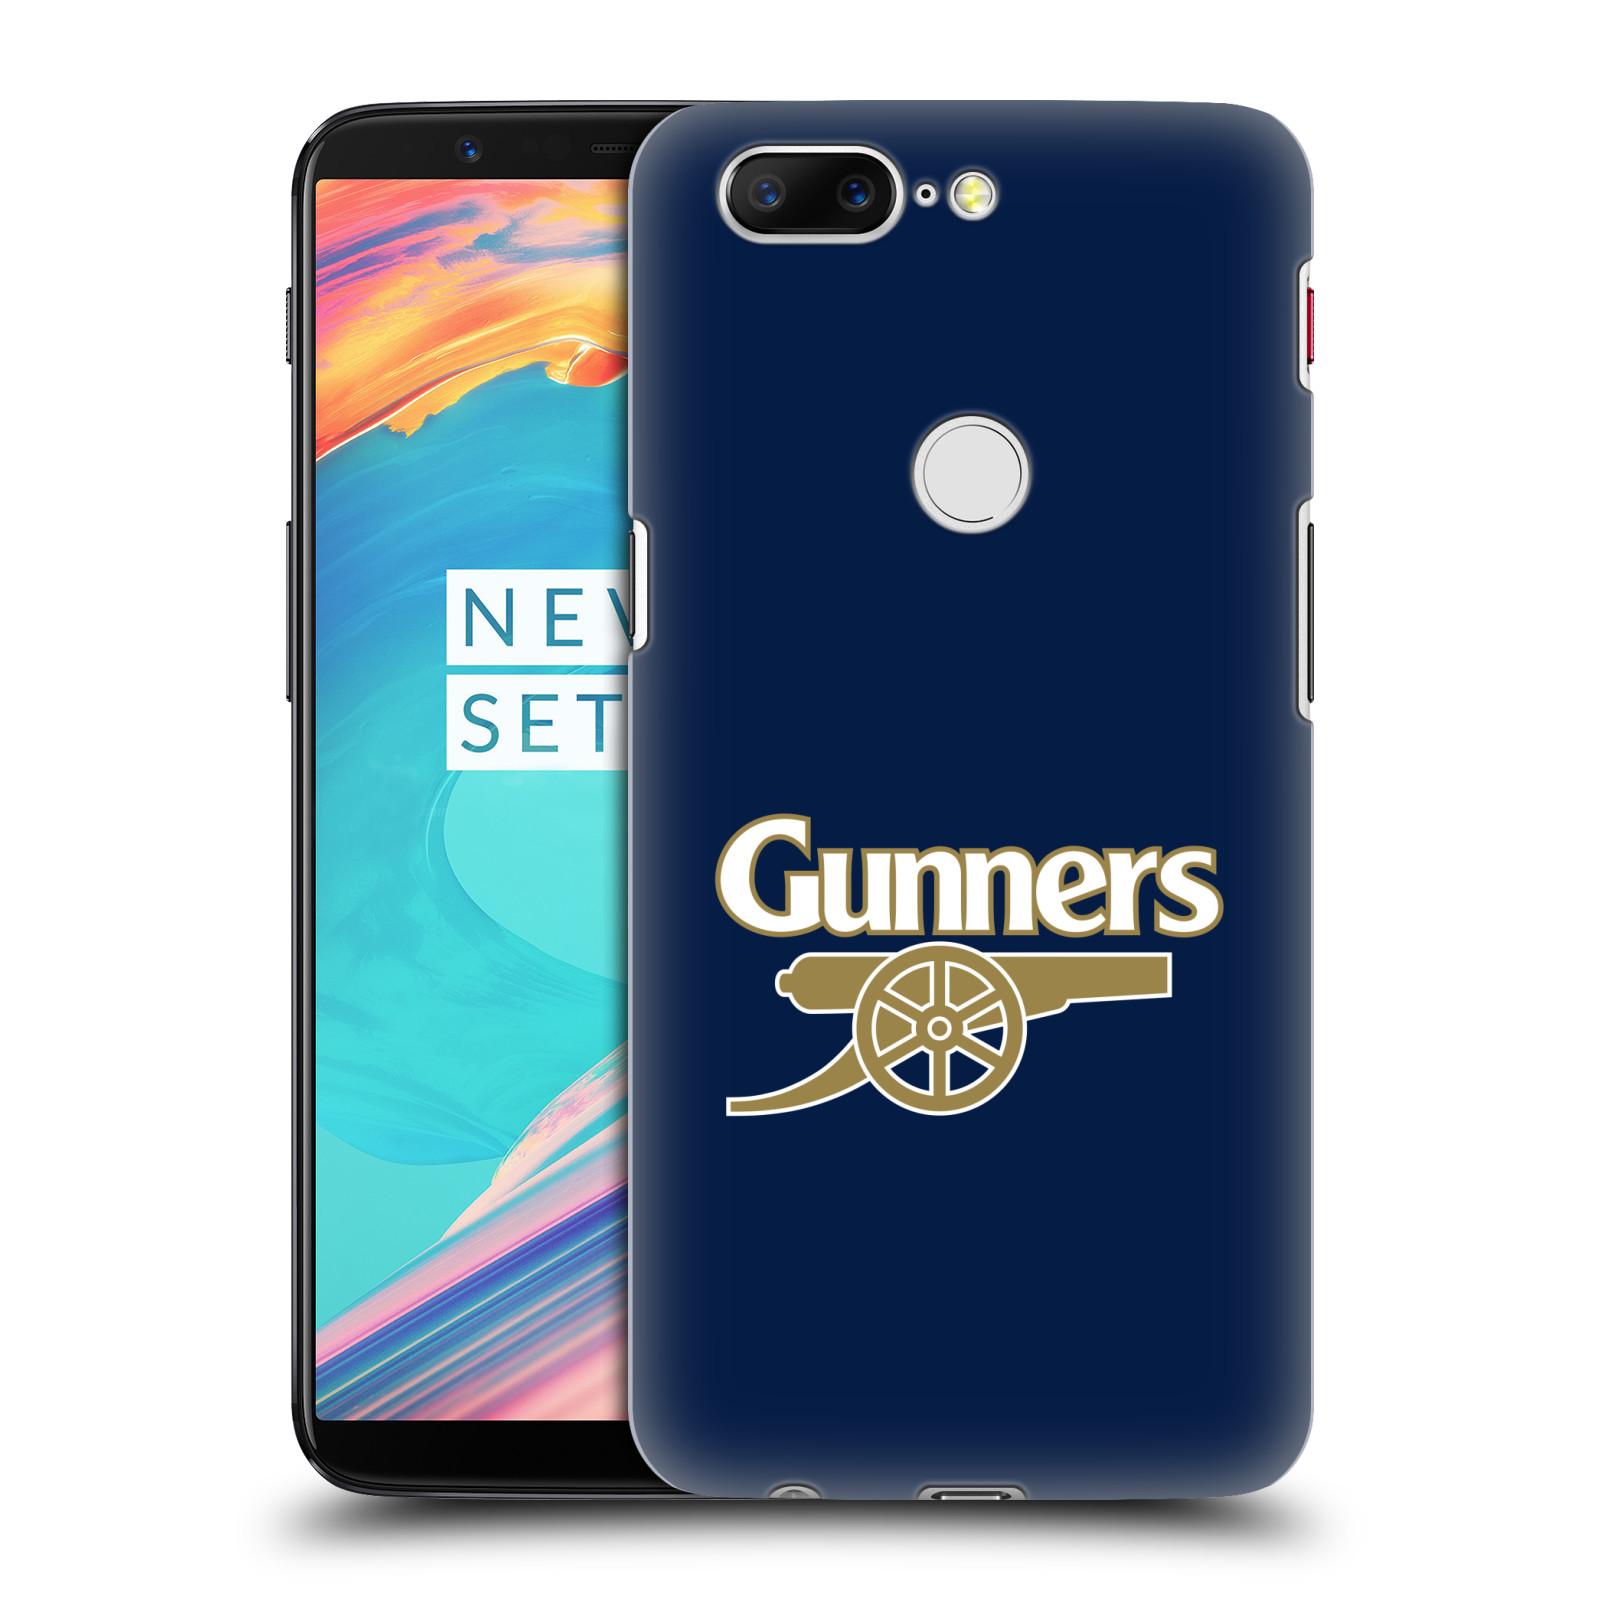 Plastové pouzdro na mobil OnePlus 5T - Head Case - Arsenal FC - Gunners